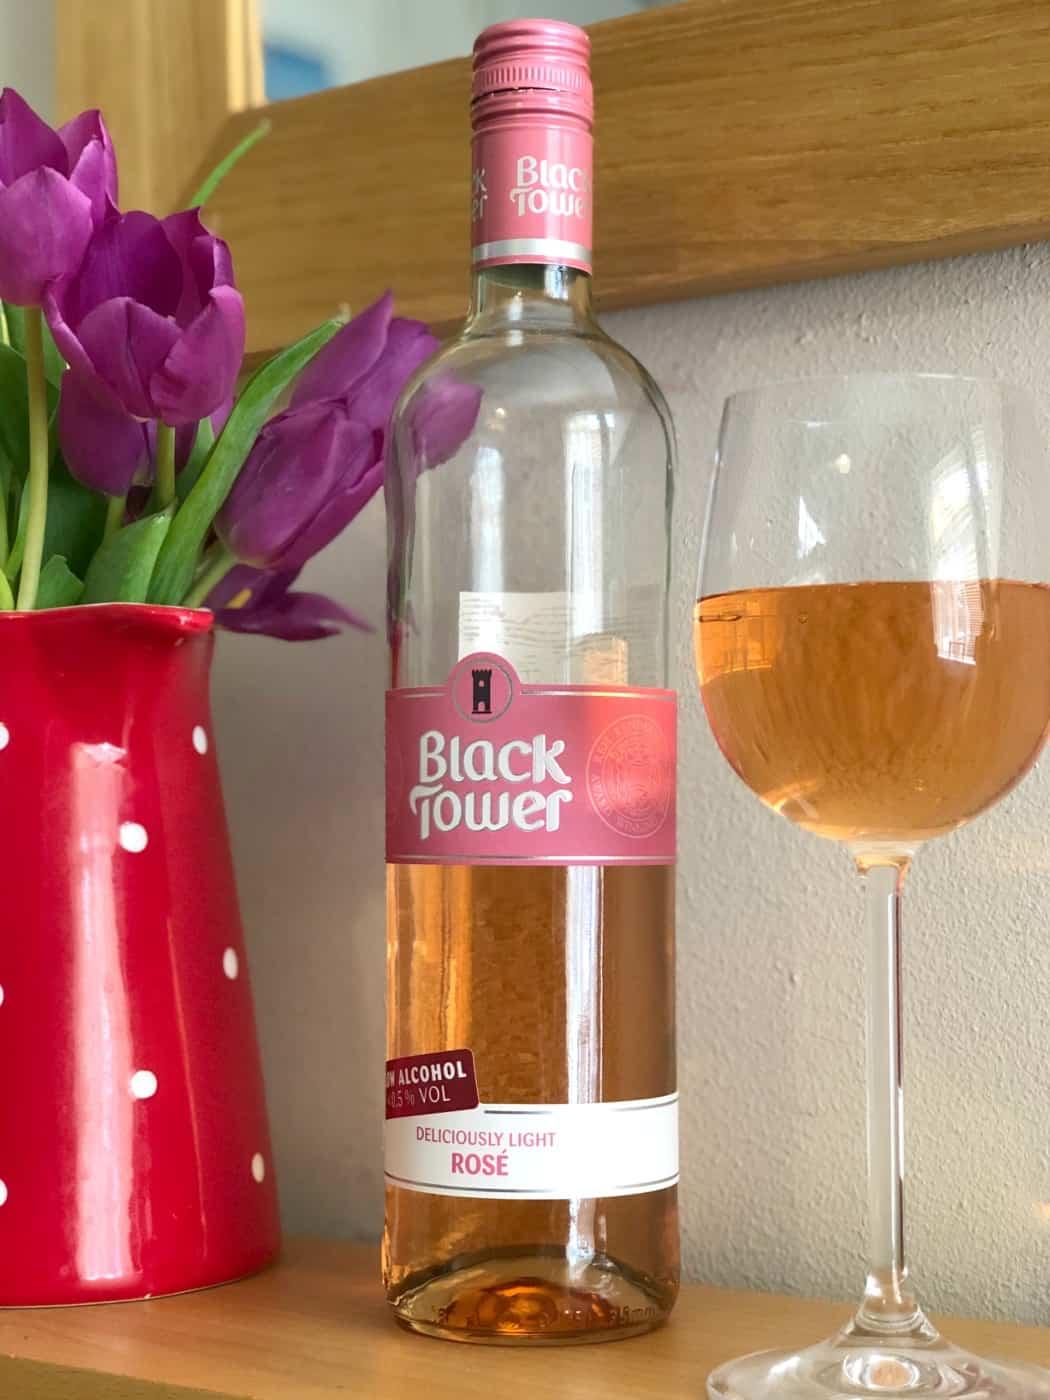 Black Tower Deliciously Light Range Wine Sparkling